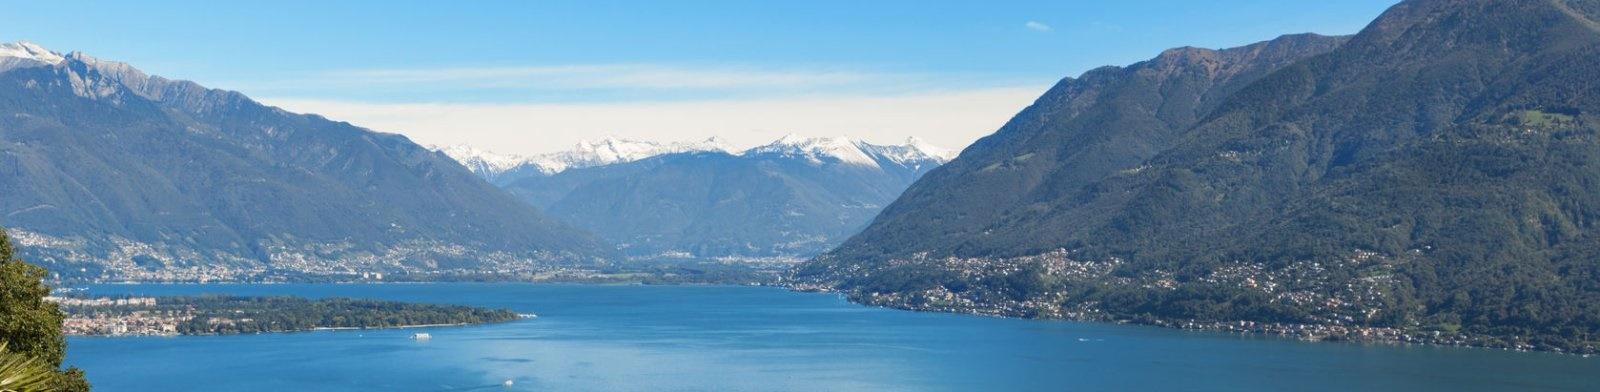 Ticino, Main Image